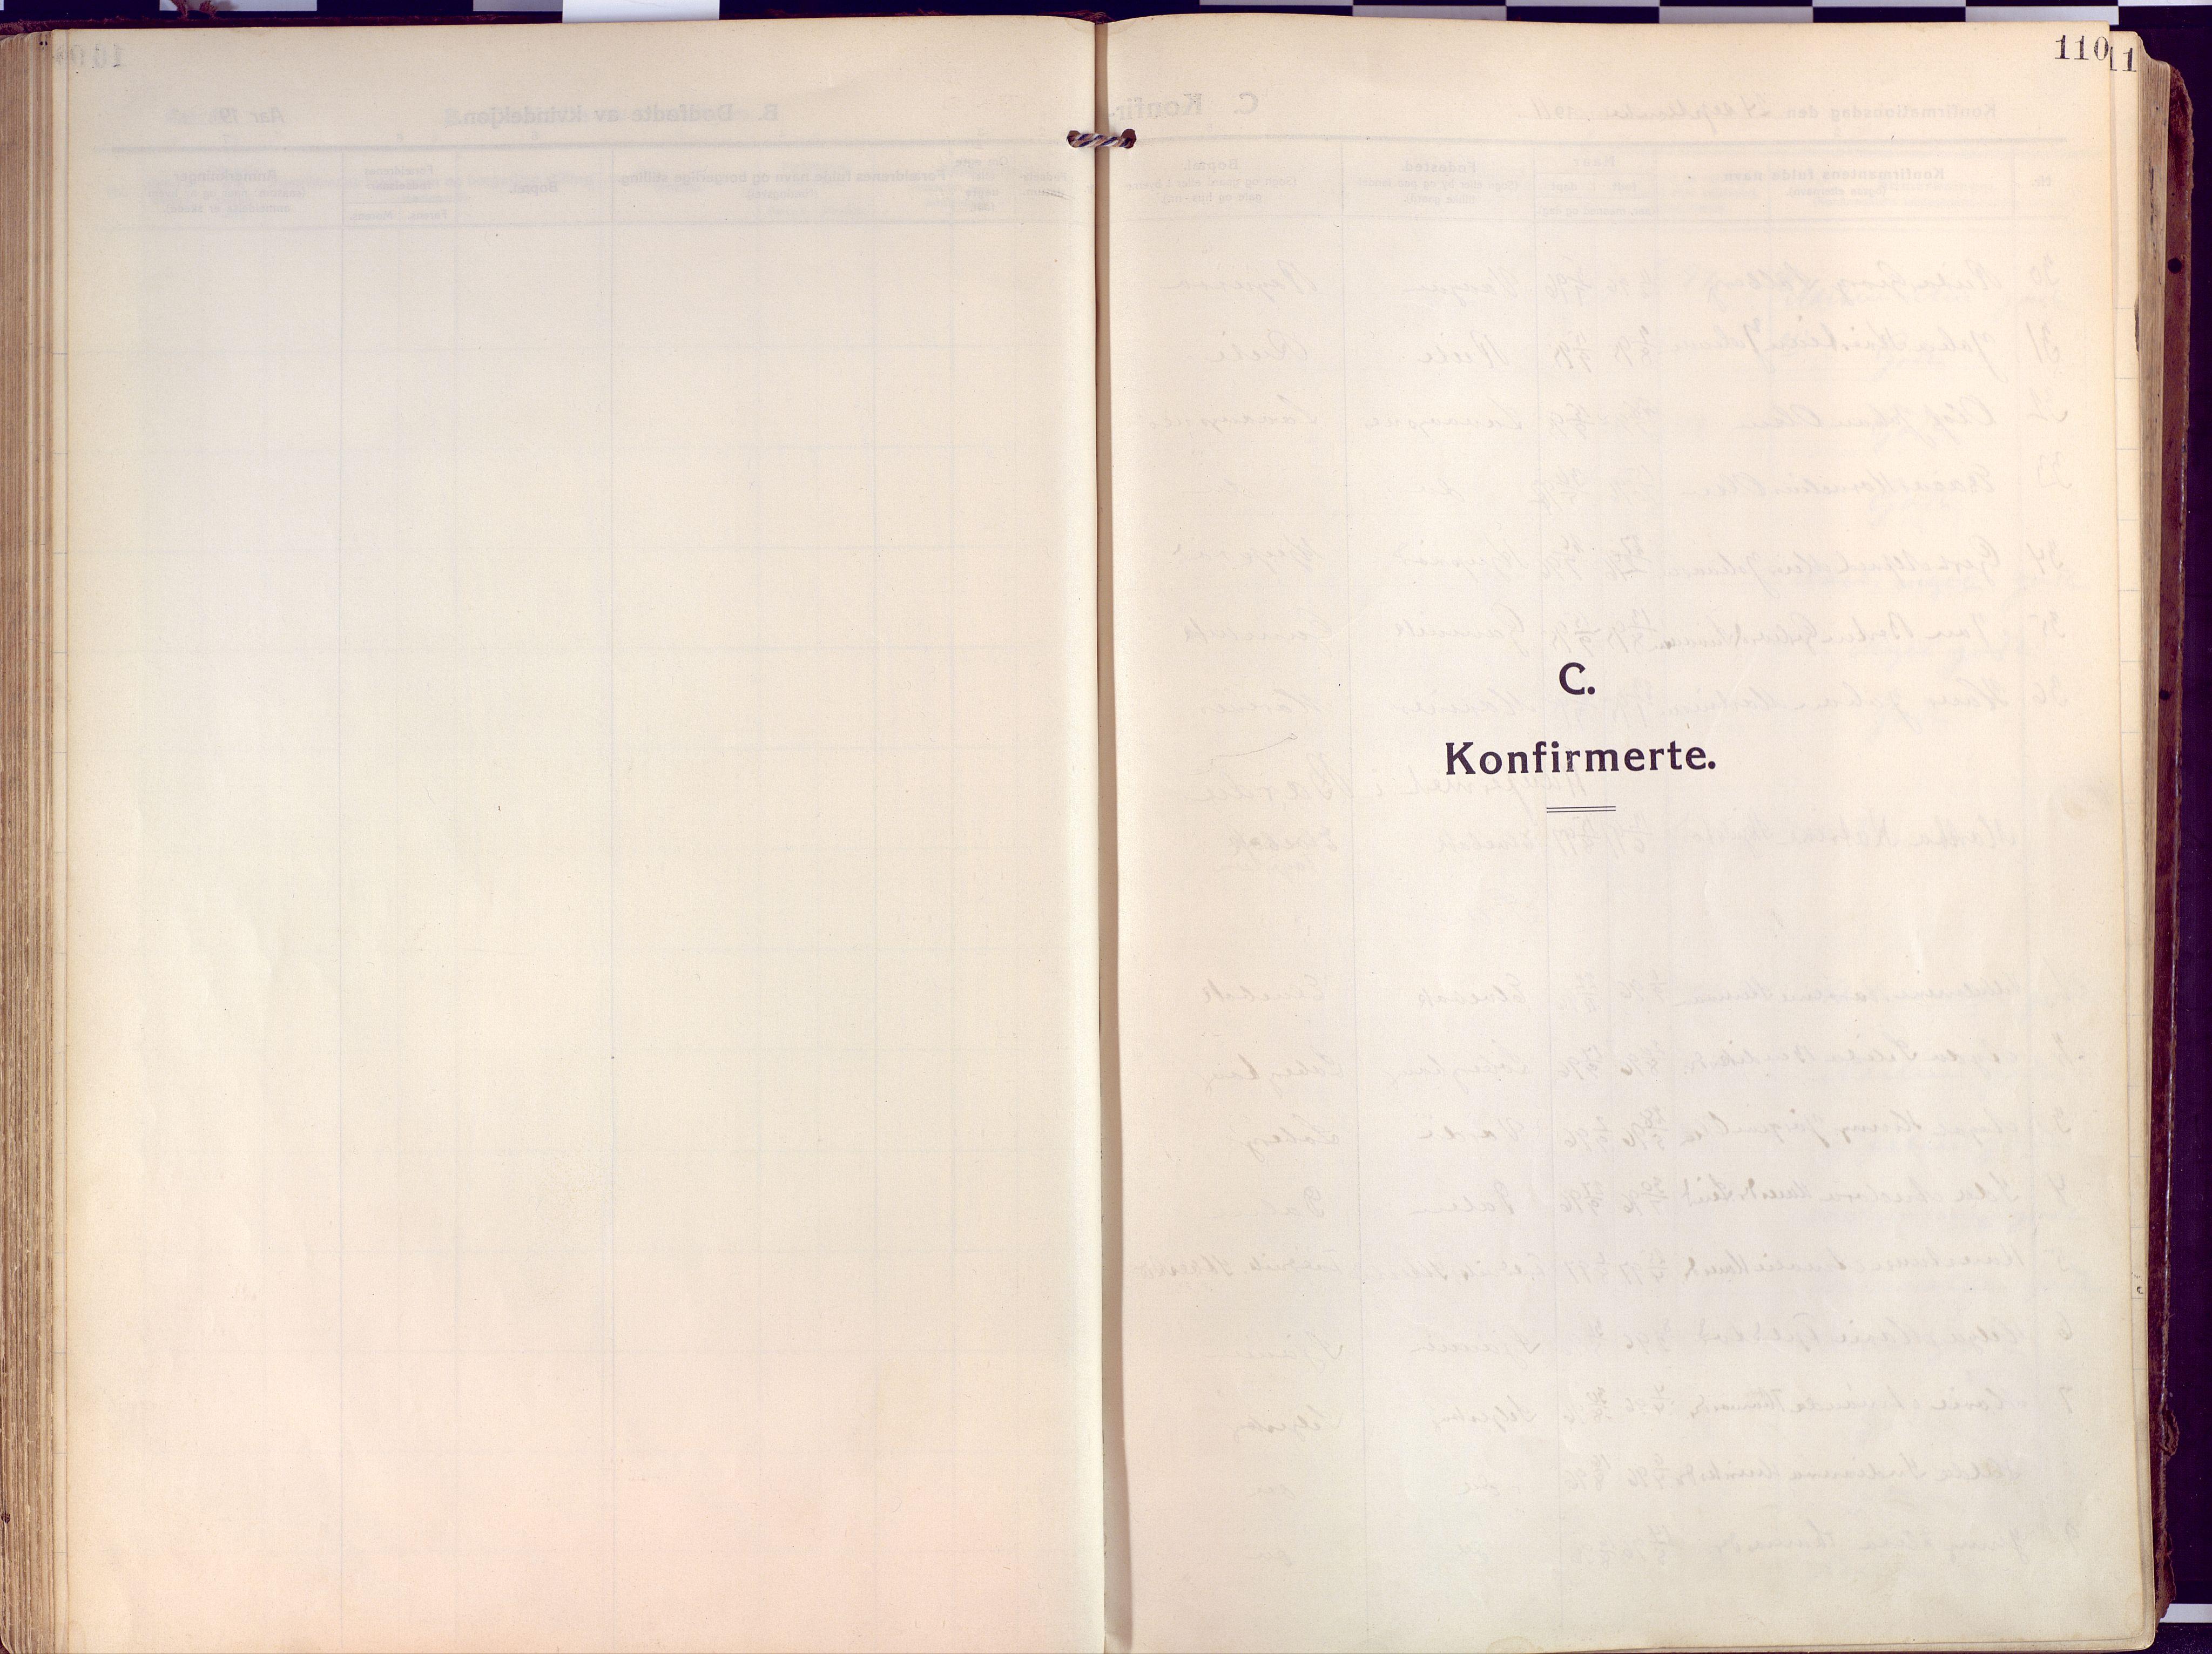 SATØ, Salangen sokneprestembete, Ministerialbok nr. 4, 1912-1927, s. 110